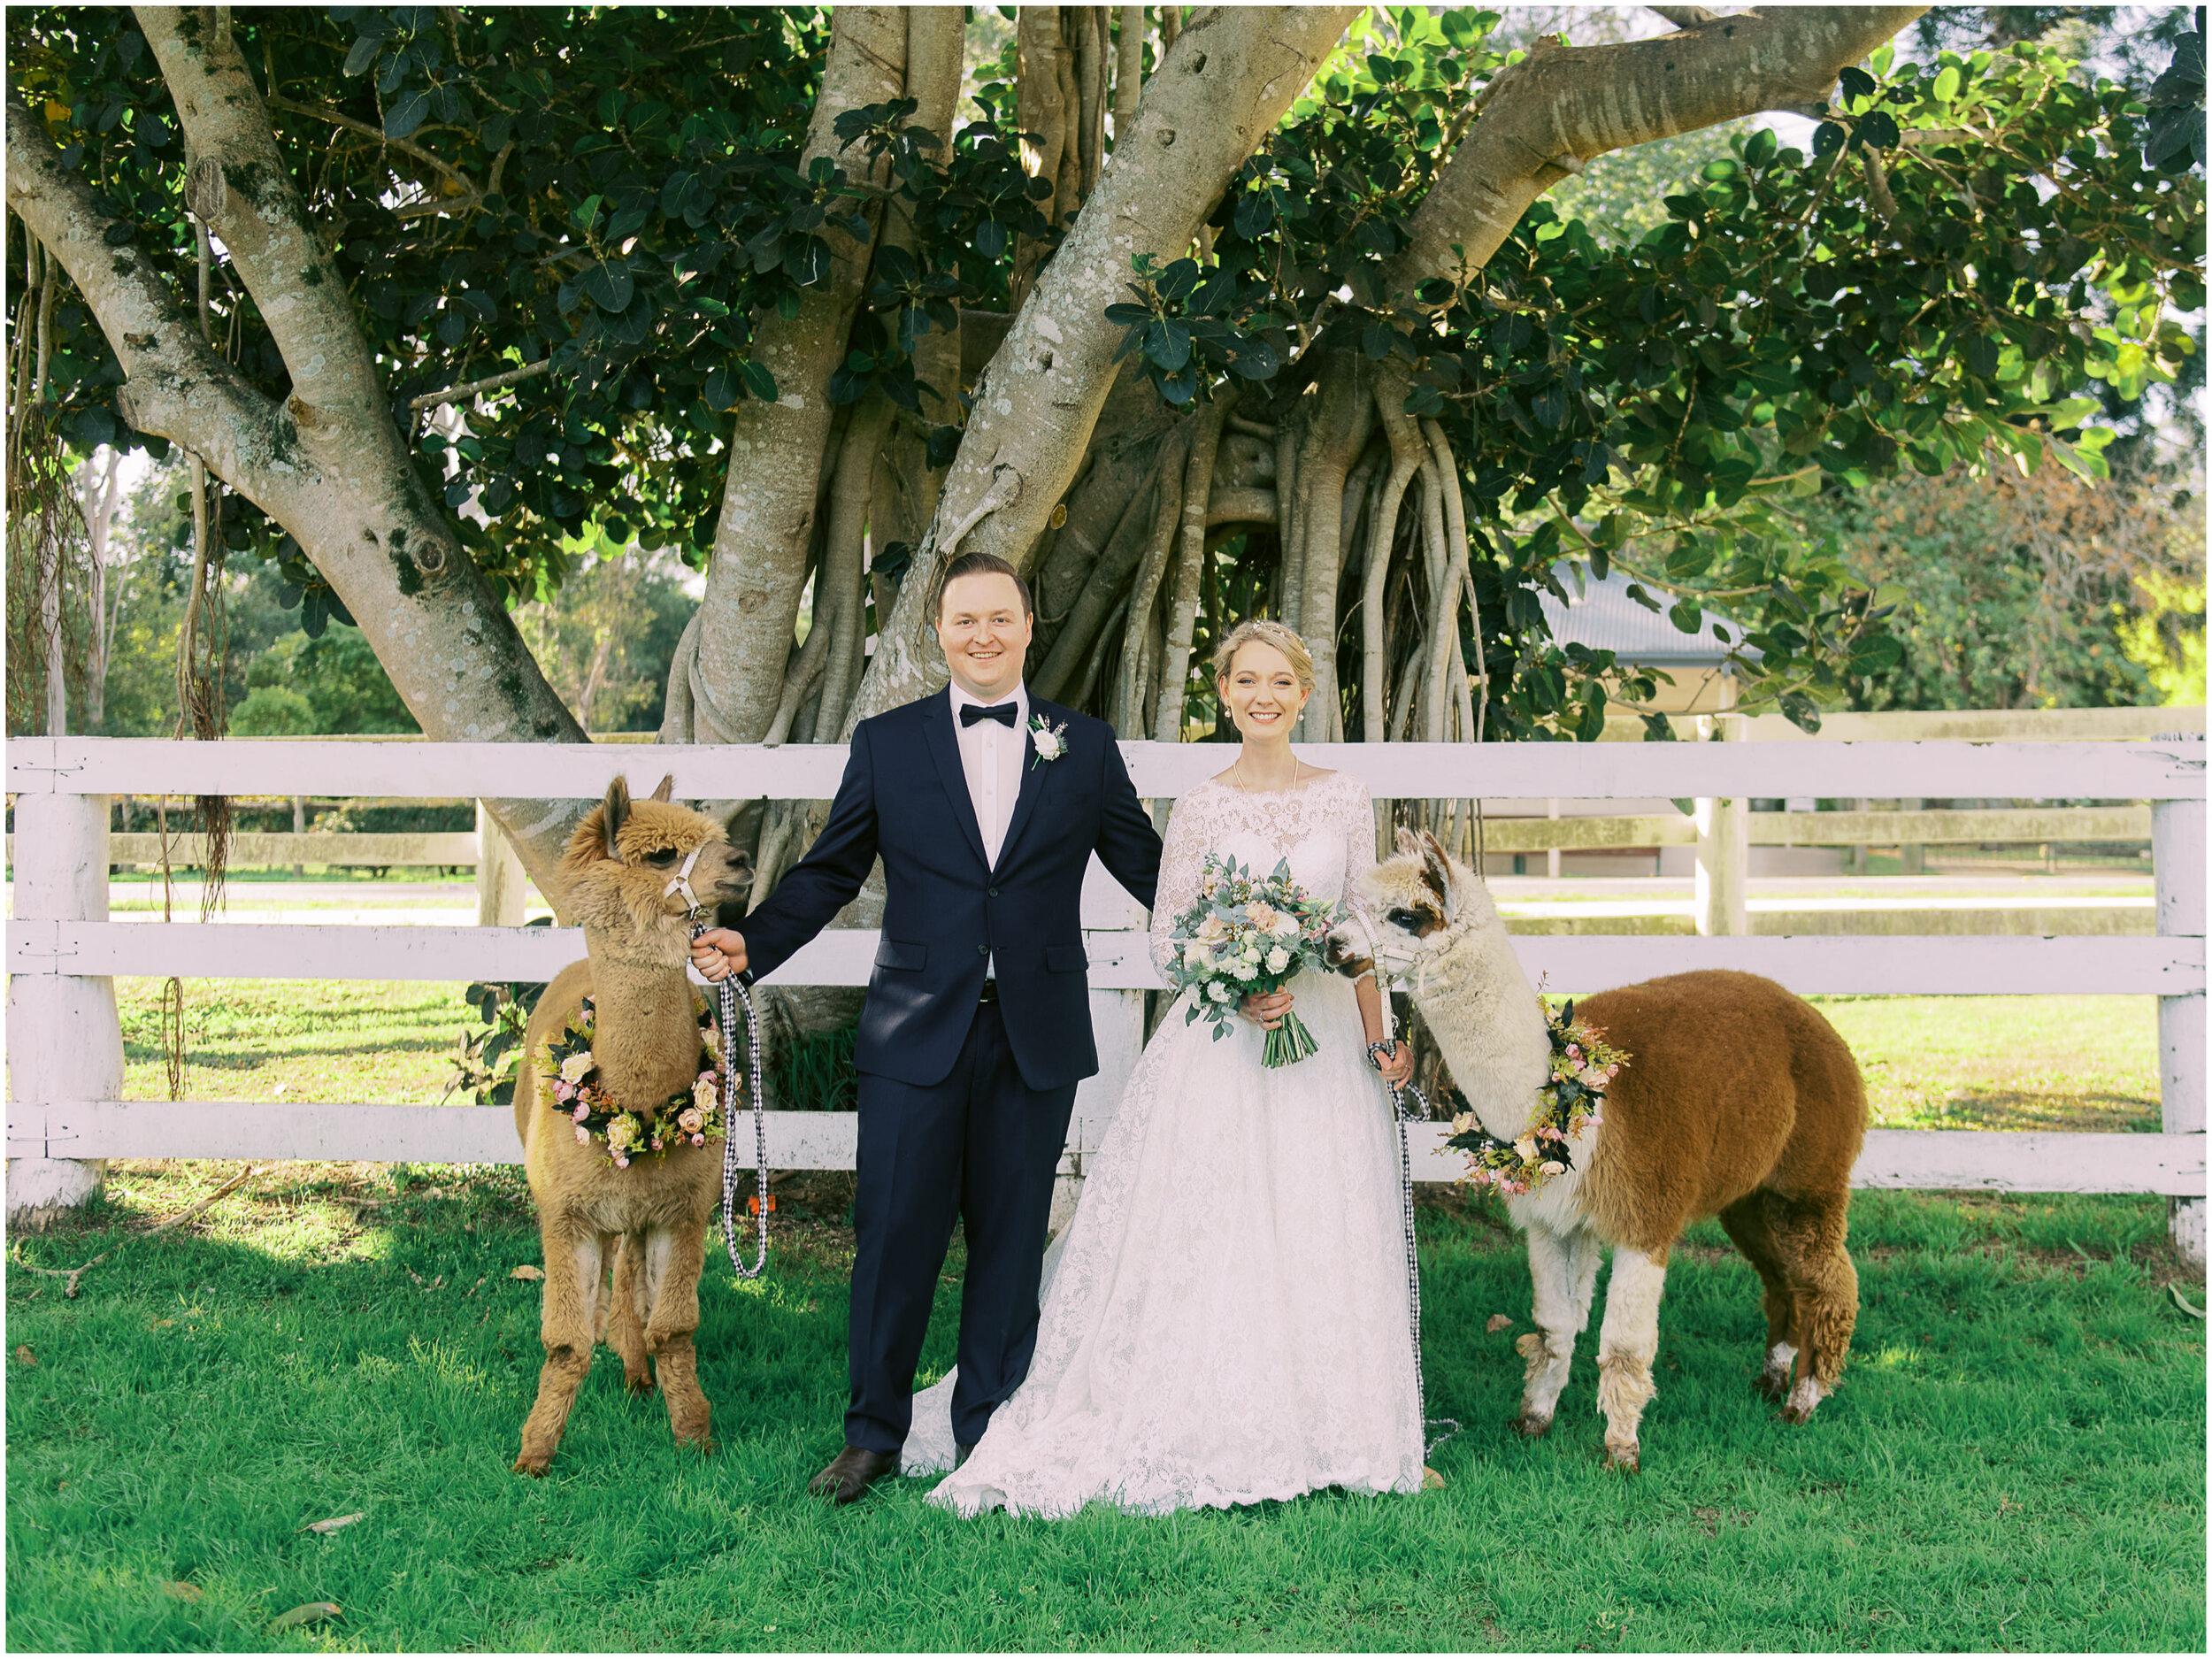 brisbane-film-wedding-photographer-lauren-olivia-luxury-wedding-australia-01-12.jpg